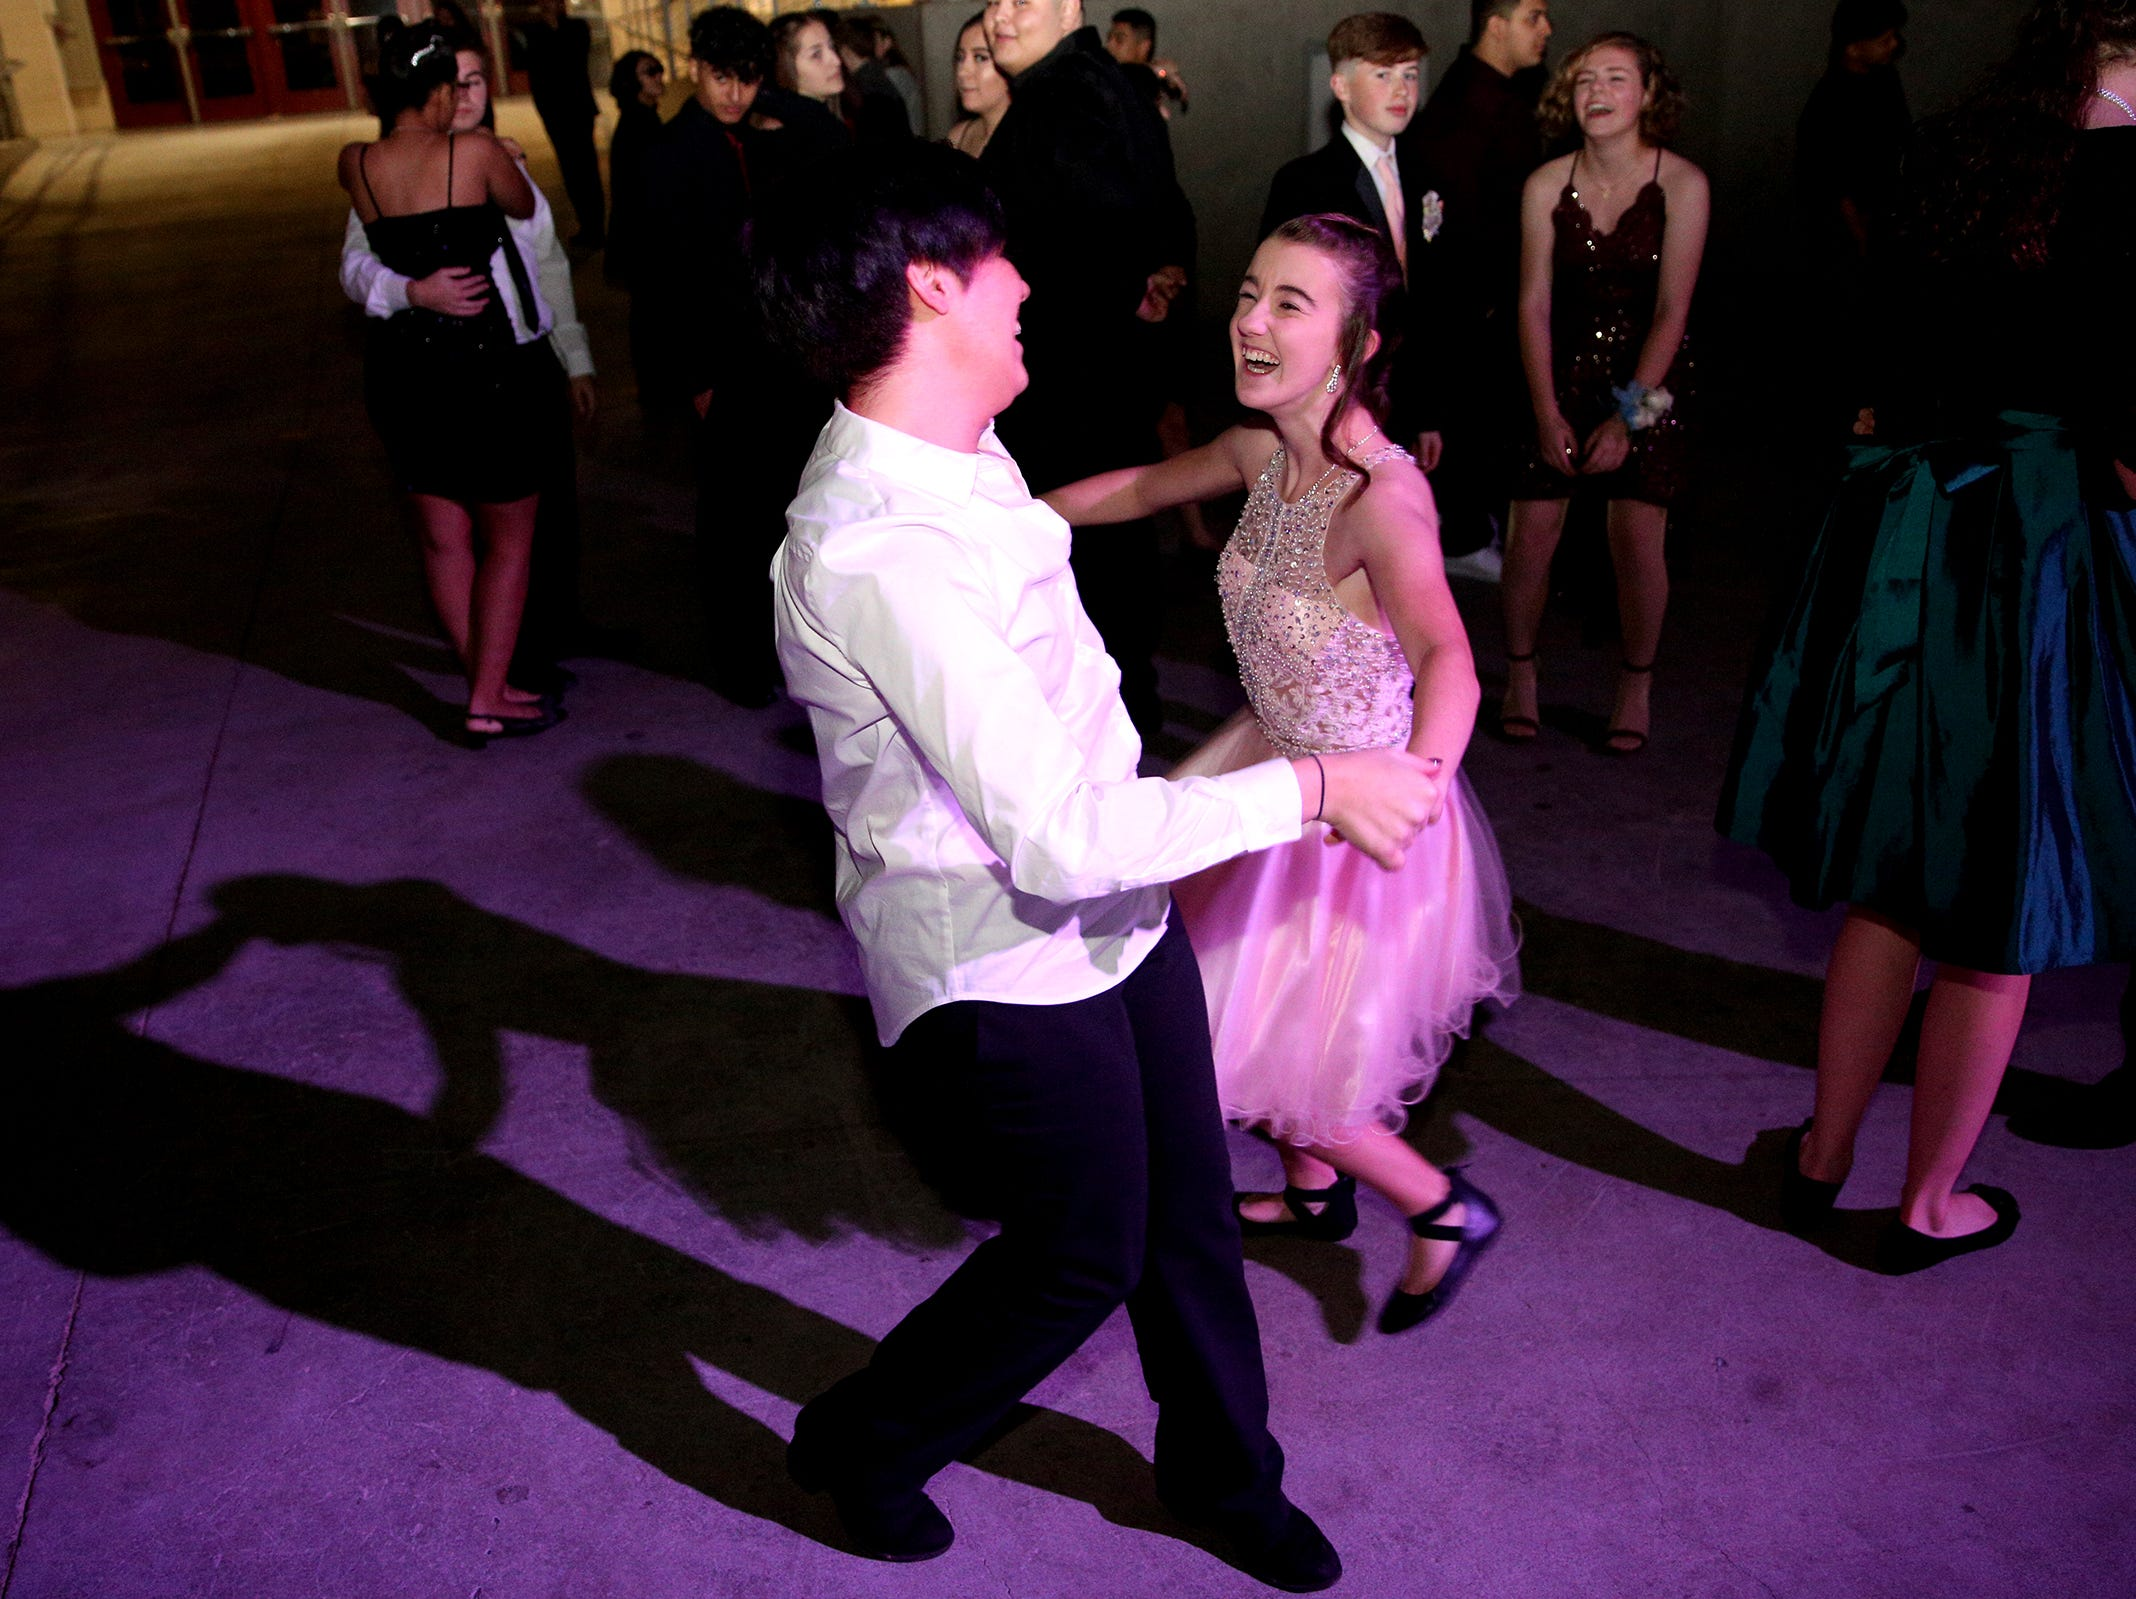 West Salem freshman Randa Lee and Breanna Hamel dance at the SnoBall at the Oregon State Fairgrounds Pavilion in Salem on Saturday, Dec. 1, 2018.